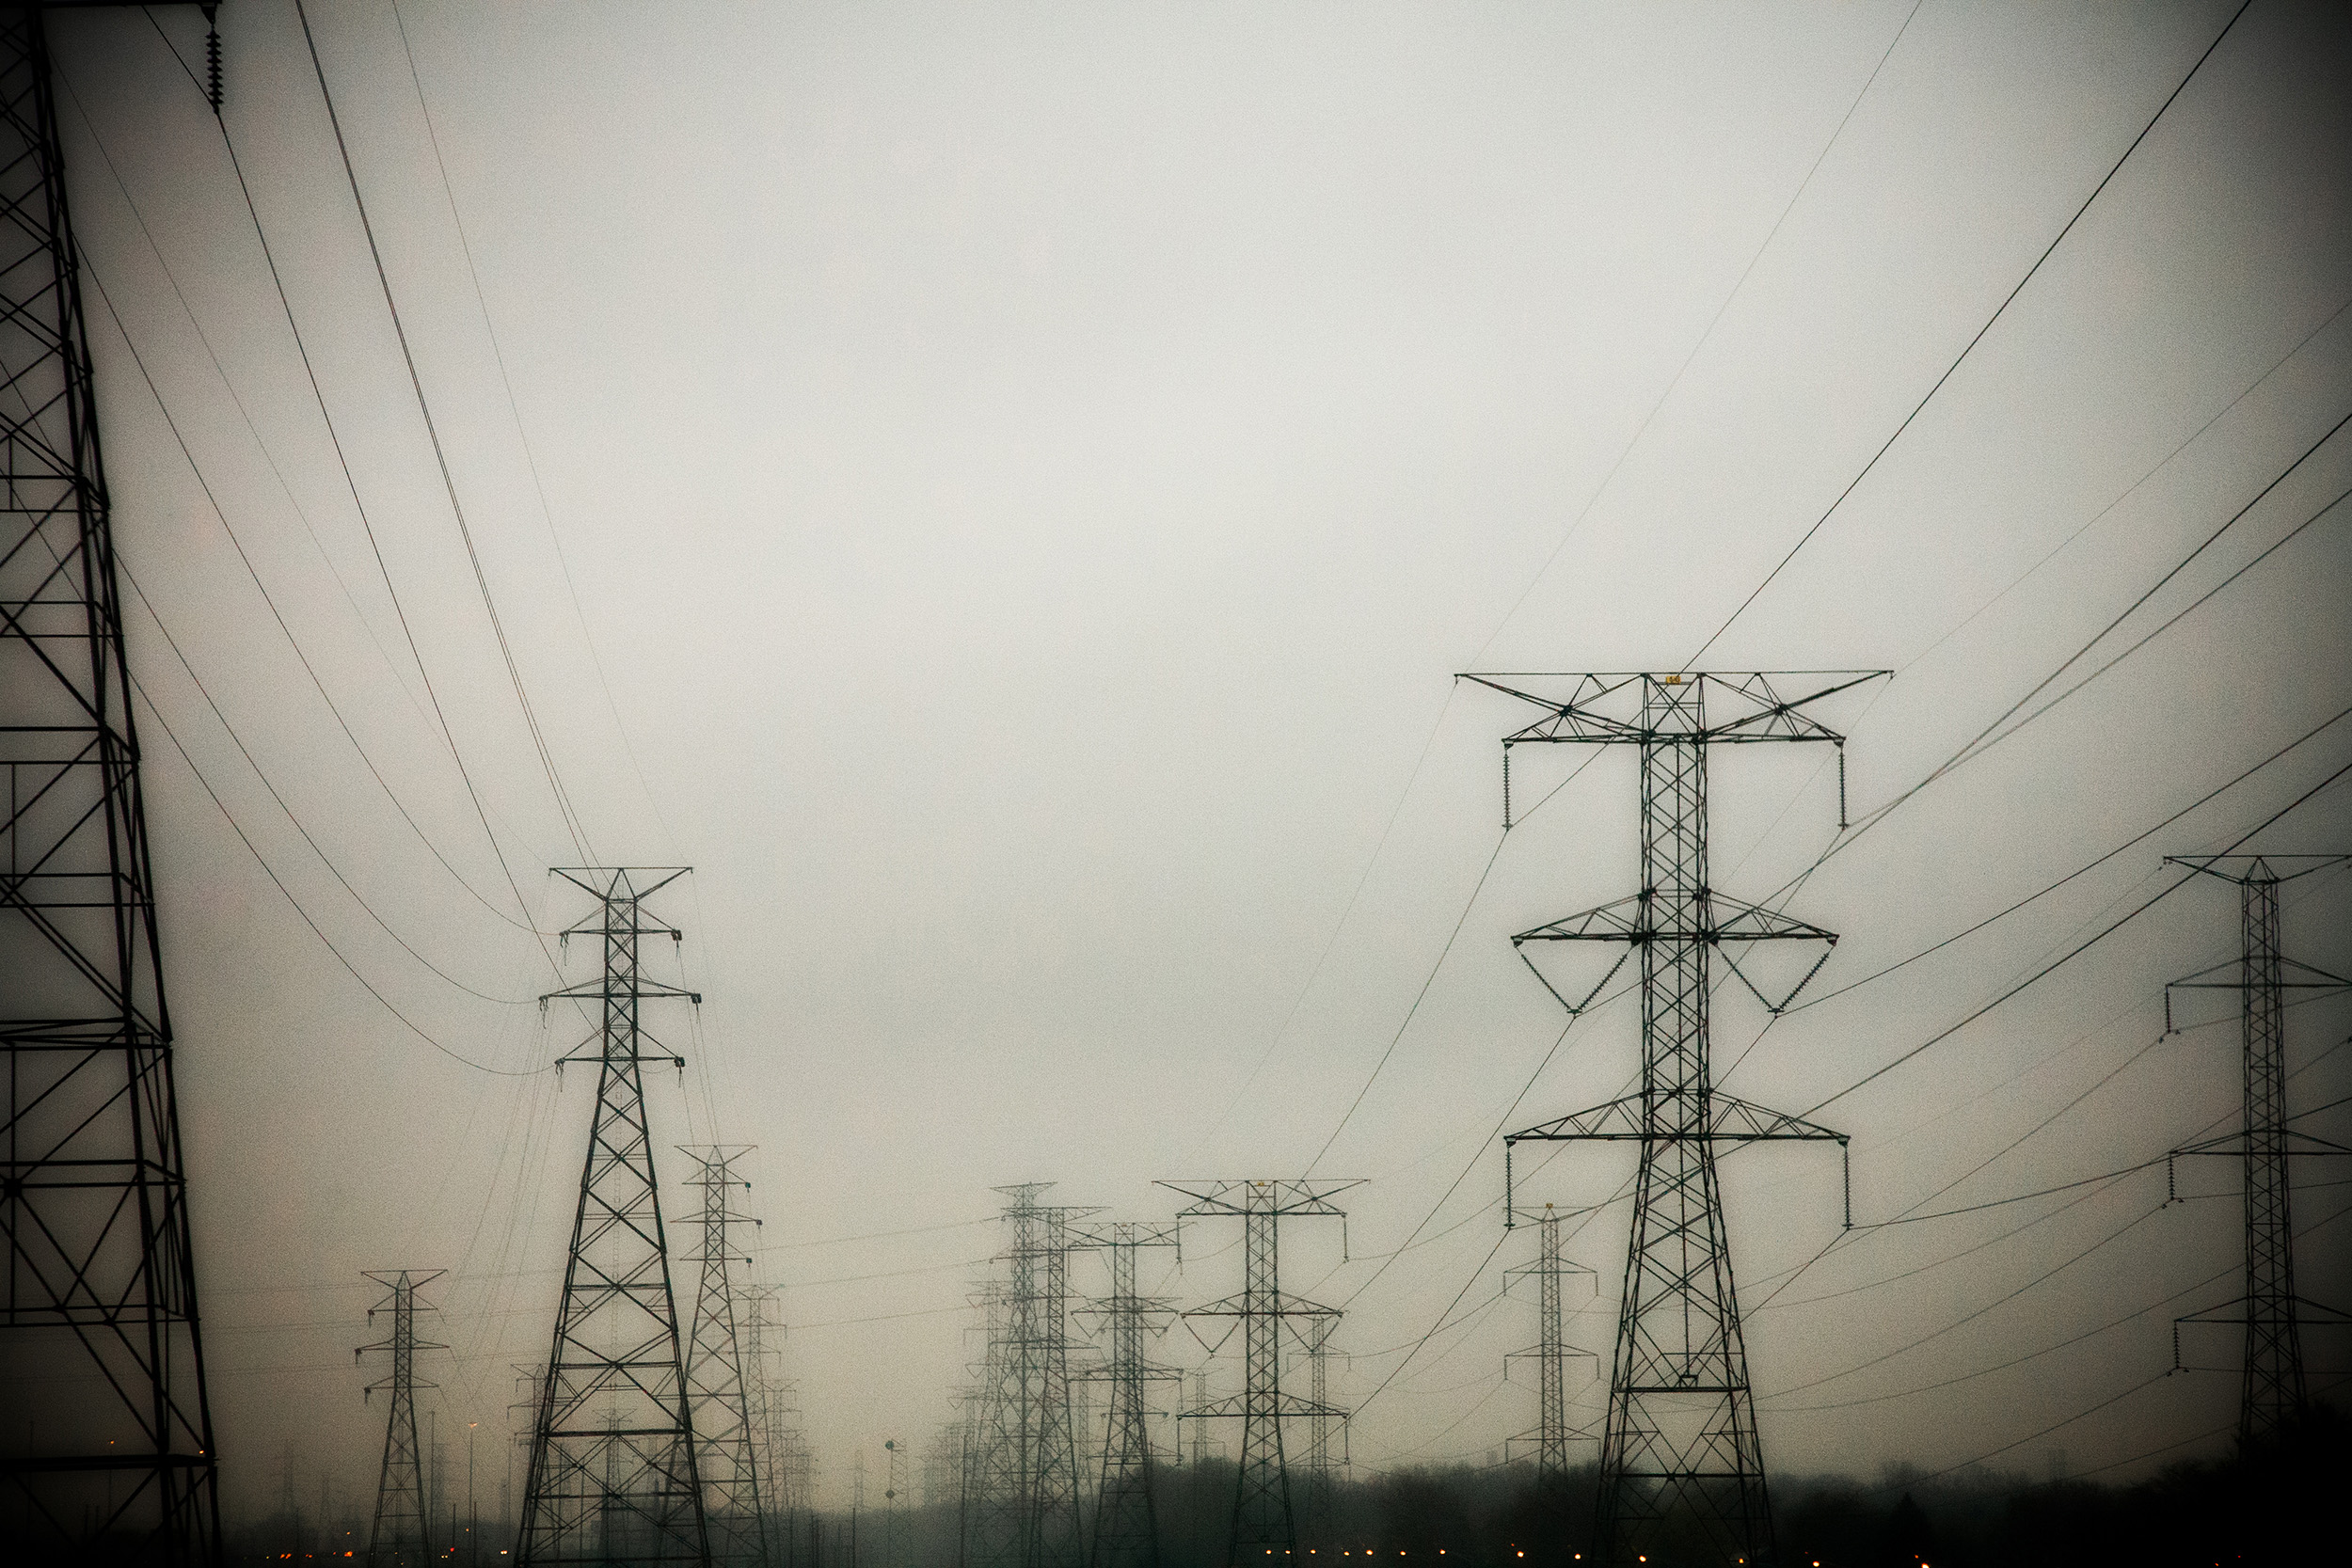 RSmith_ElectricalTowers-7039_2500.jpg